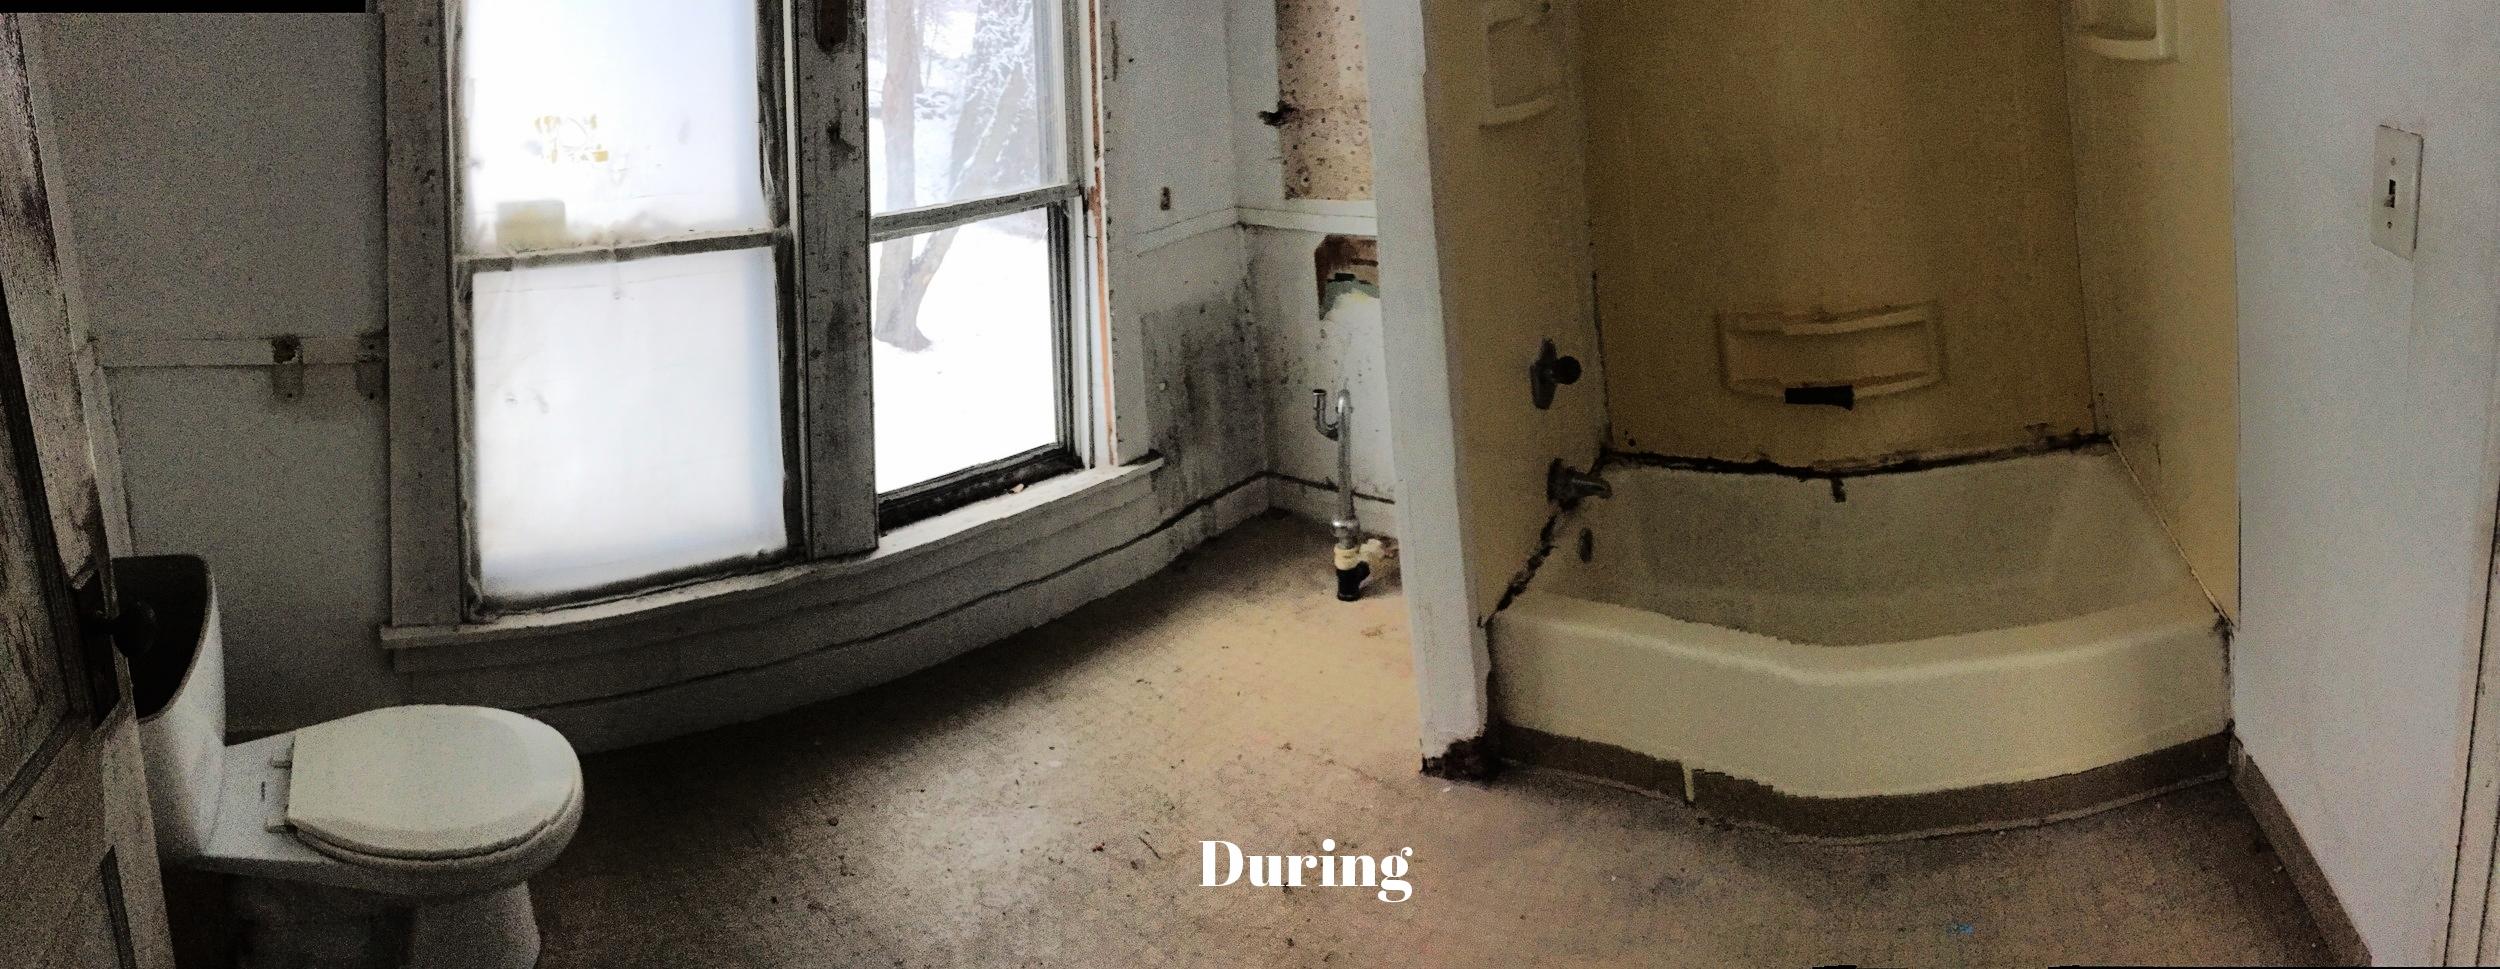 Bathroom During 5a.jpg